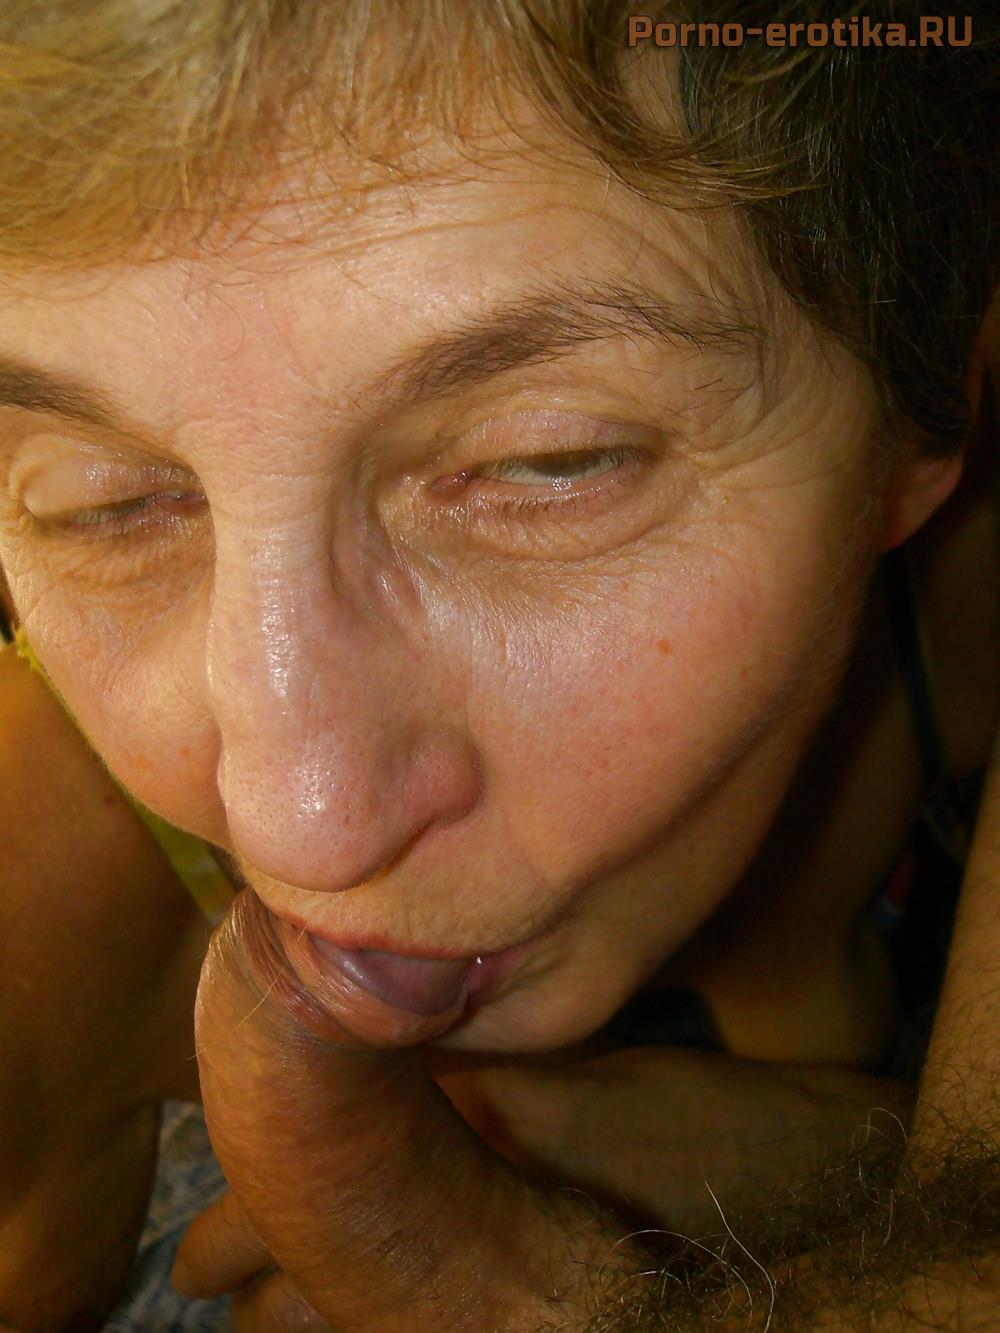 Порно актриса jessica lincoln голая фото